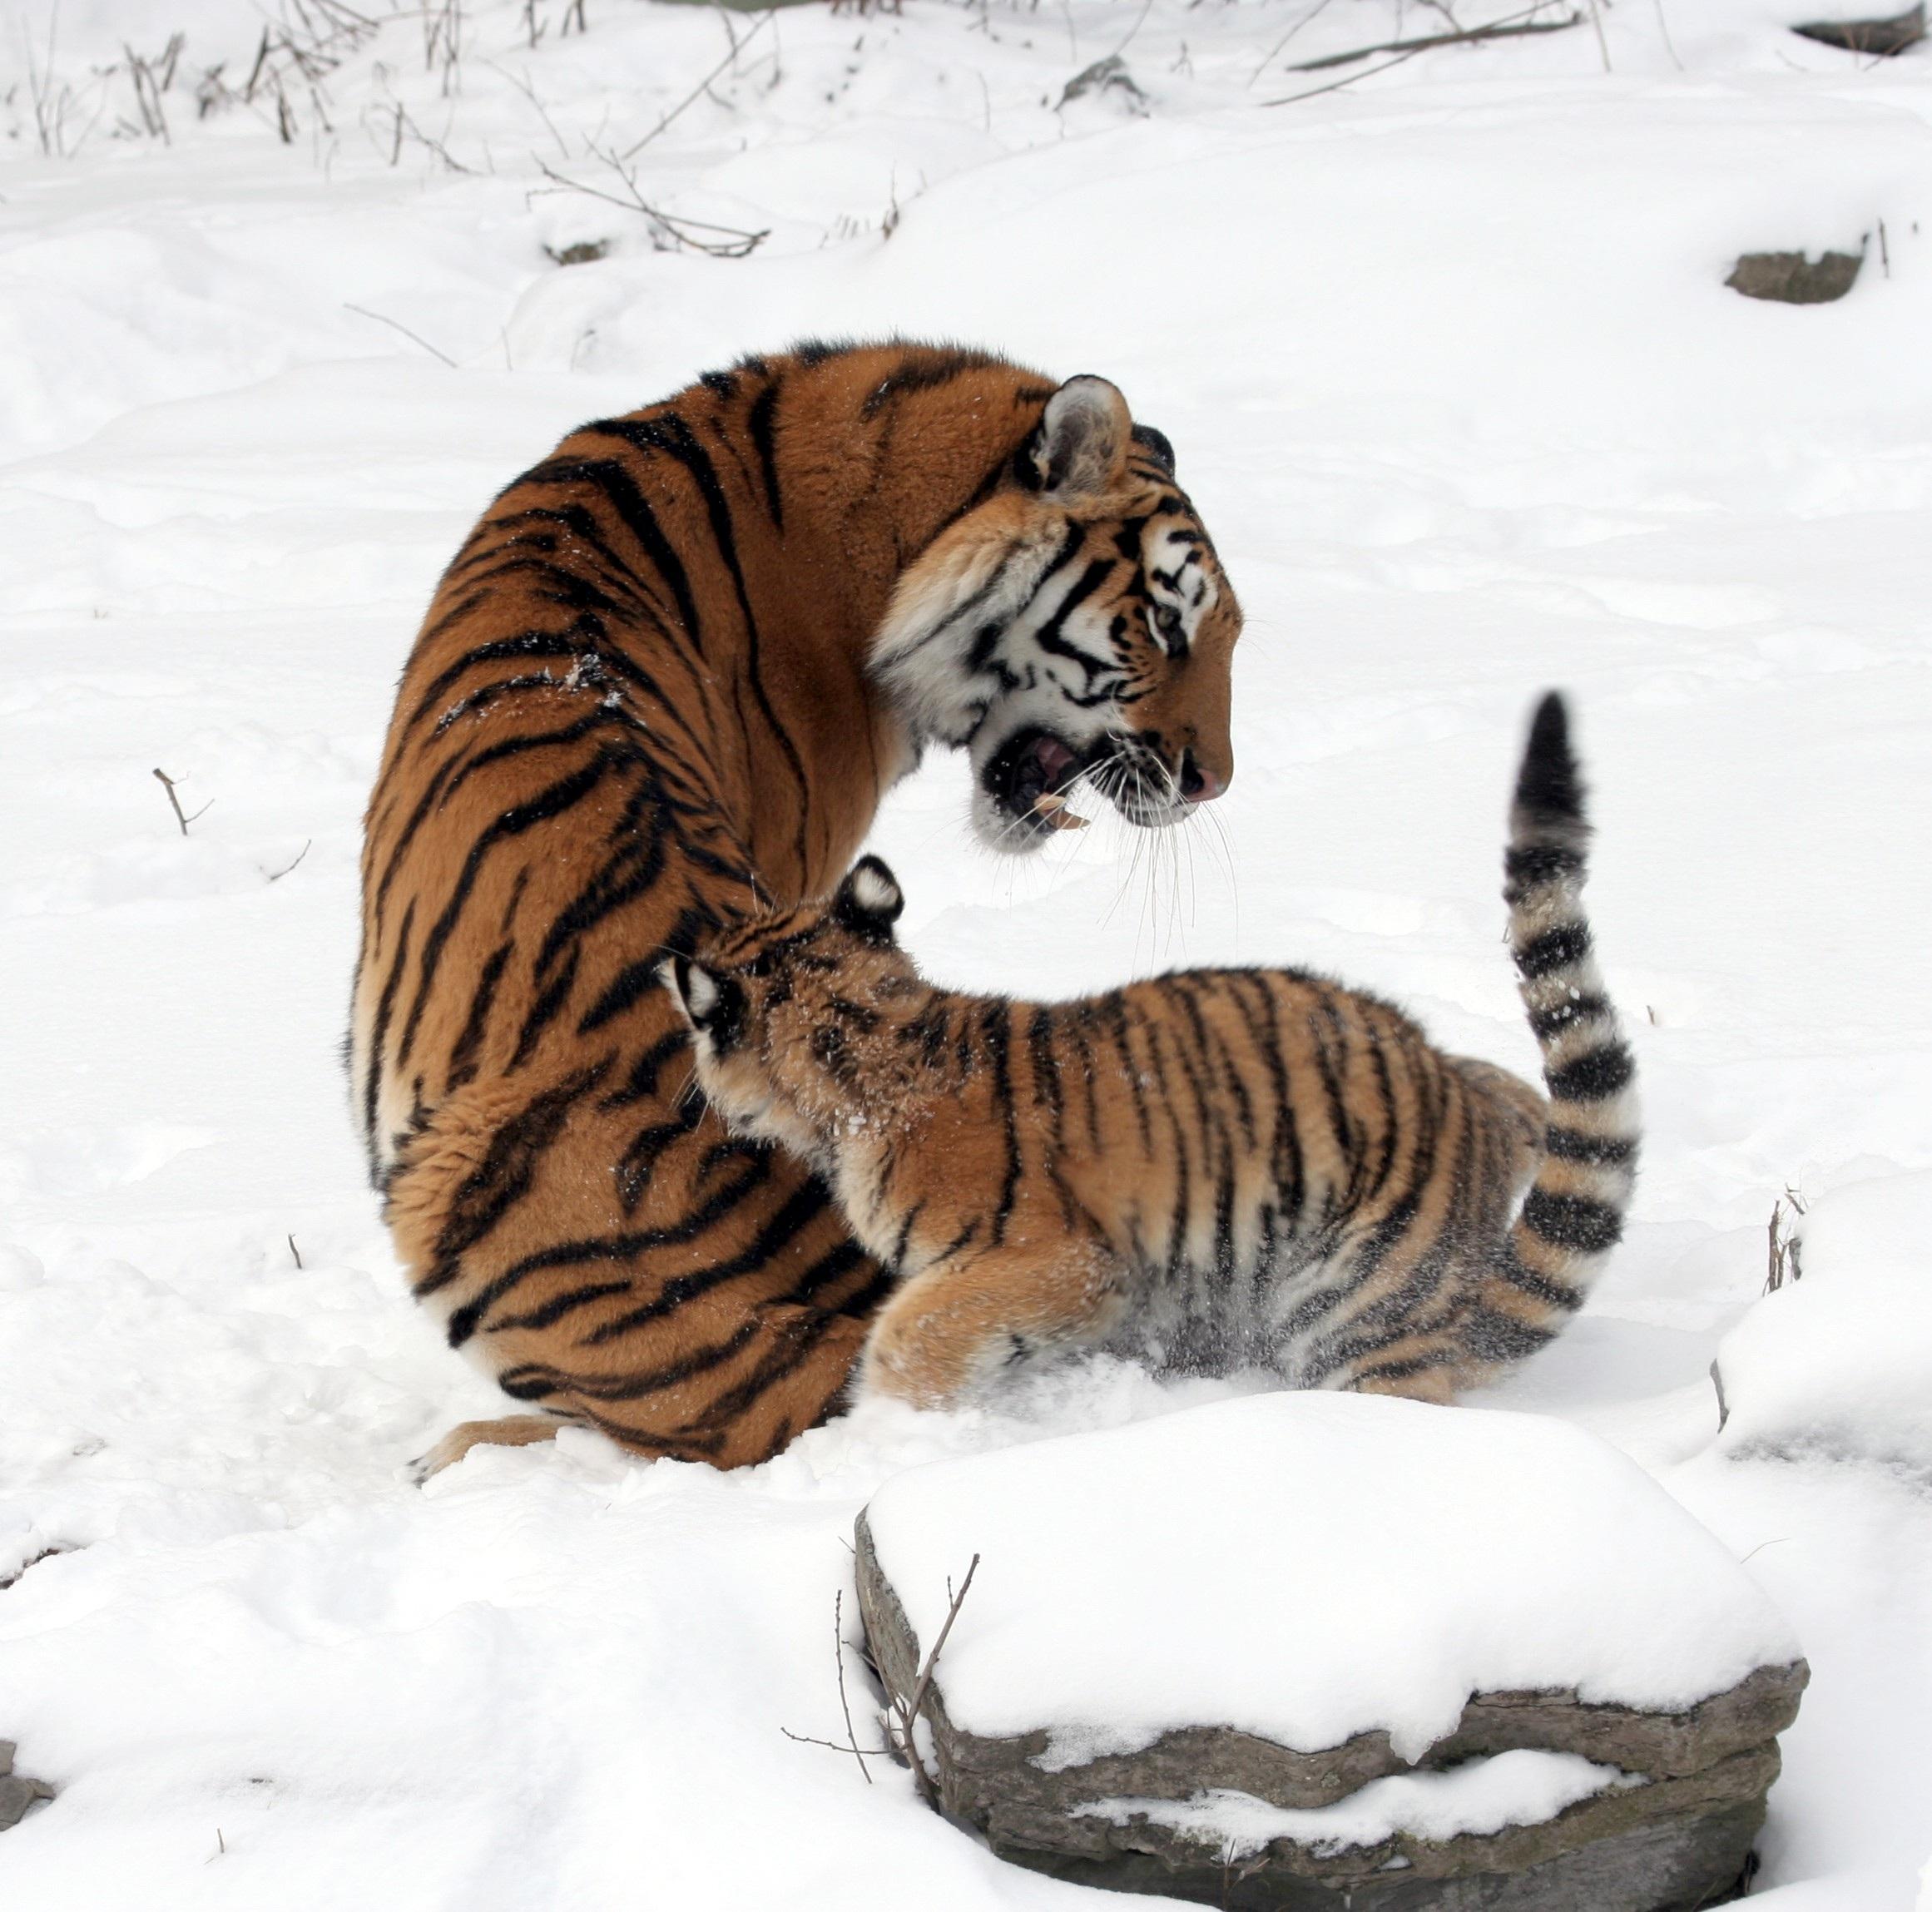 Tigers photo